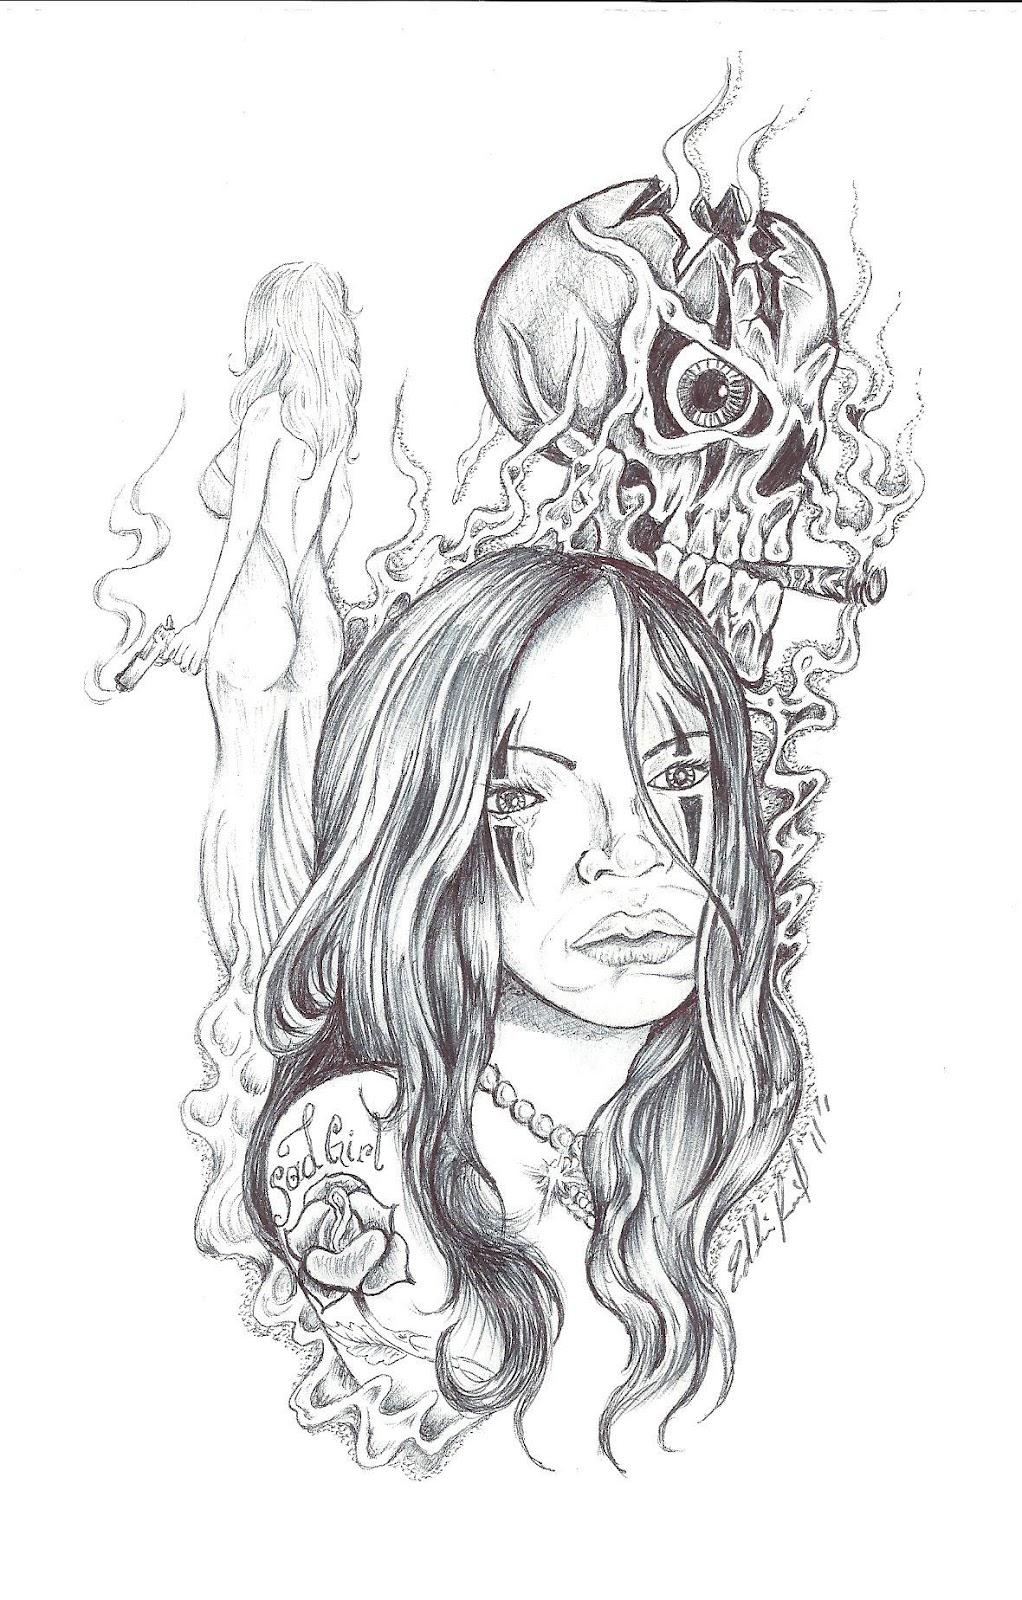 Prison art by the great tattoo artist eddie reid